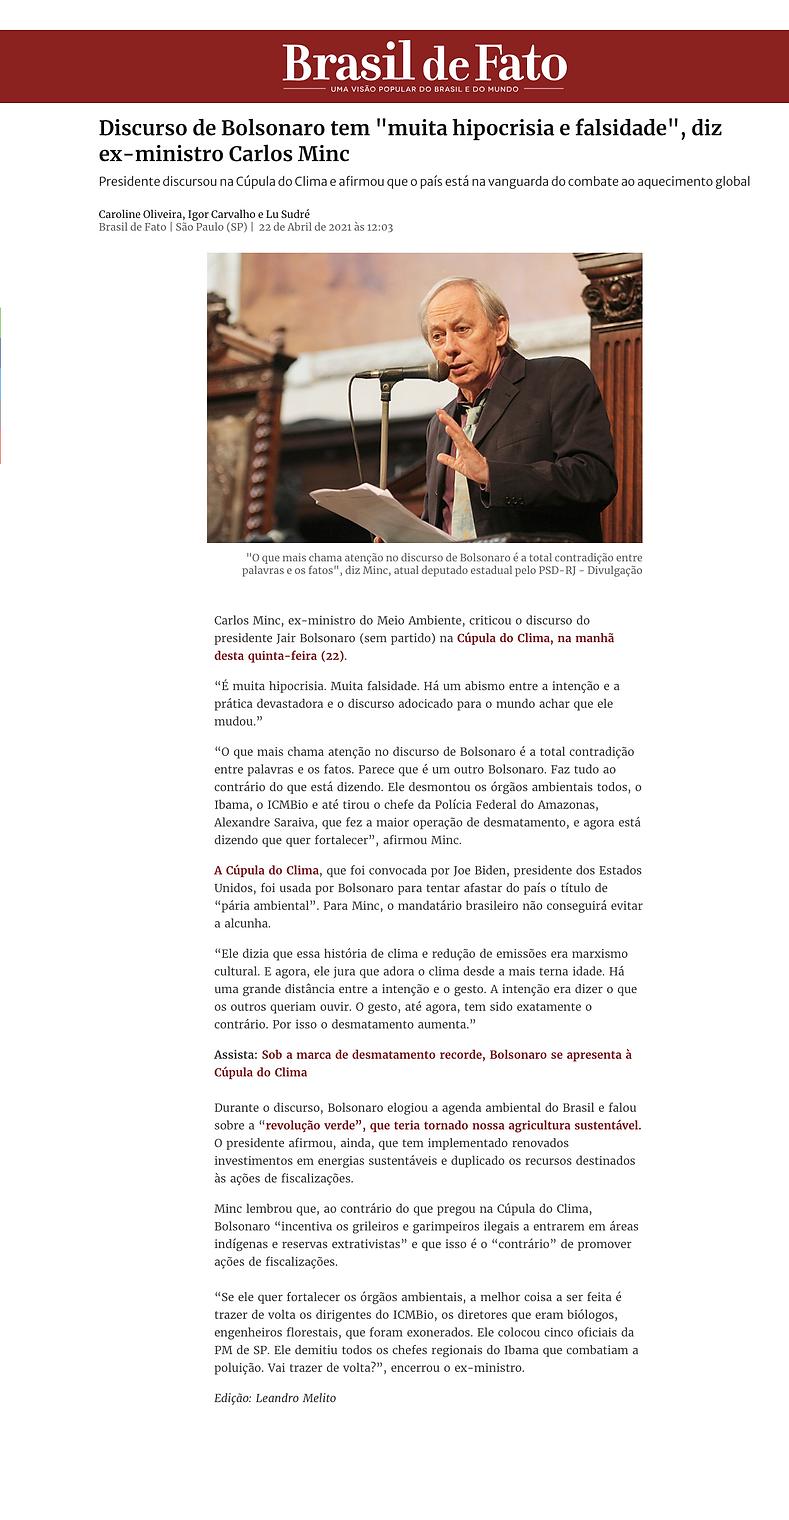 screenshot-www.brasildefato.com.br-2021.